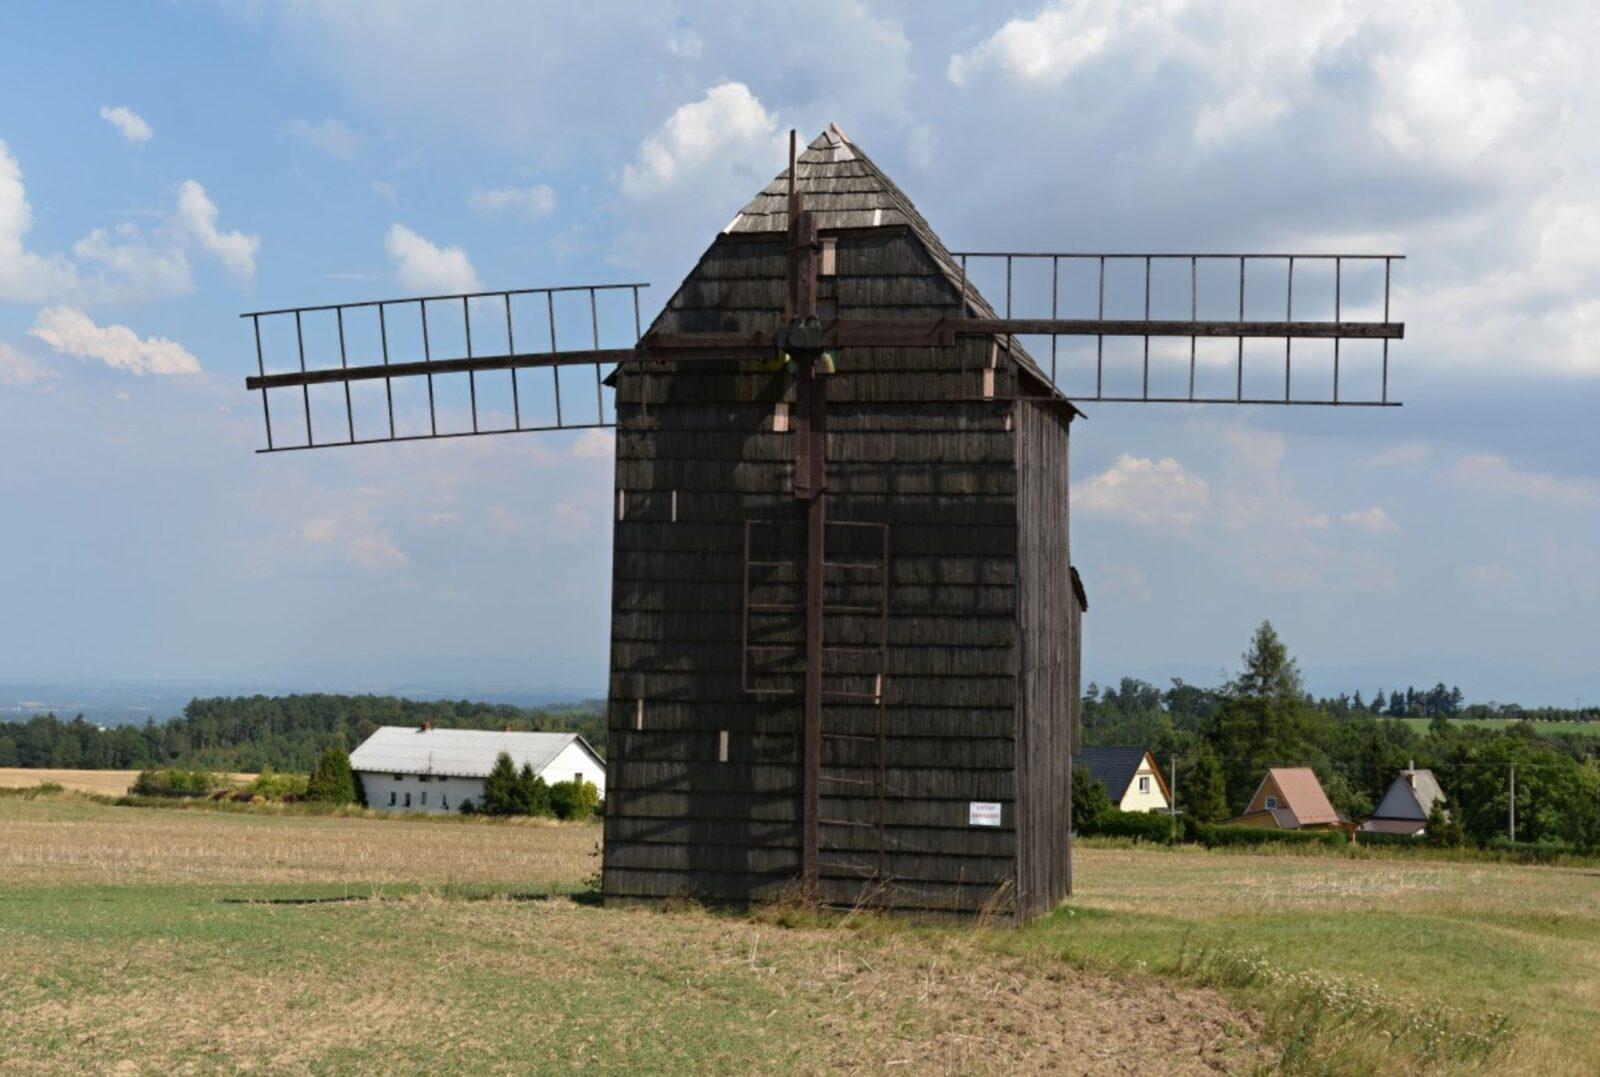 Větrný mlýn Nové Dvory, 25. 7. 2018, zdroj: www.bilovec.cz